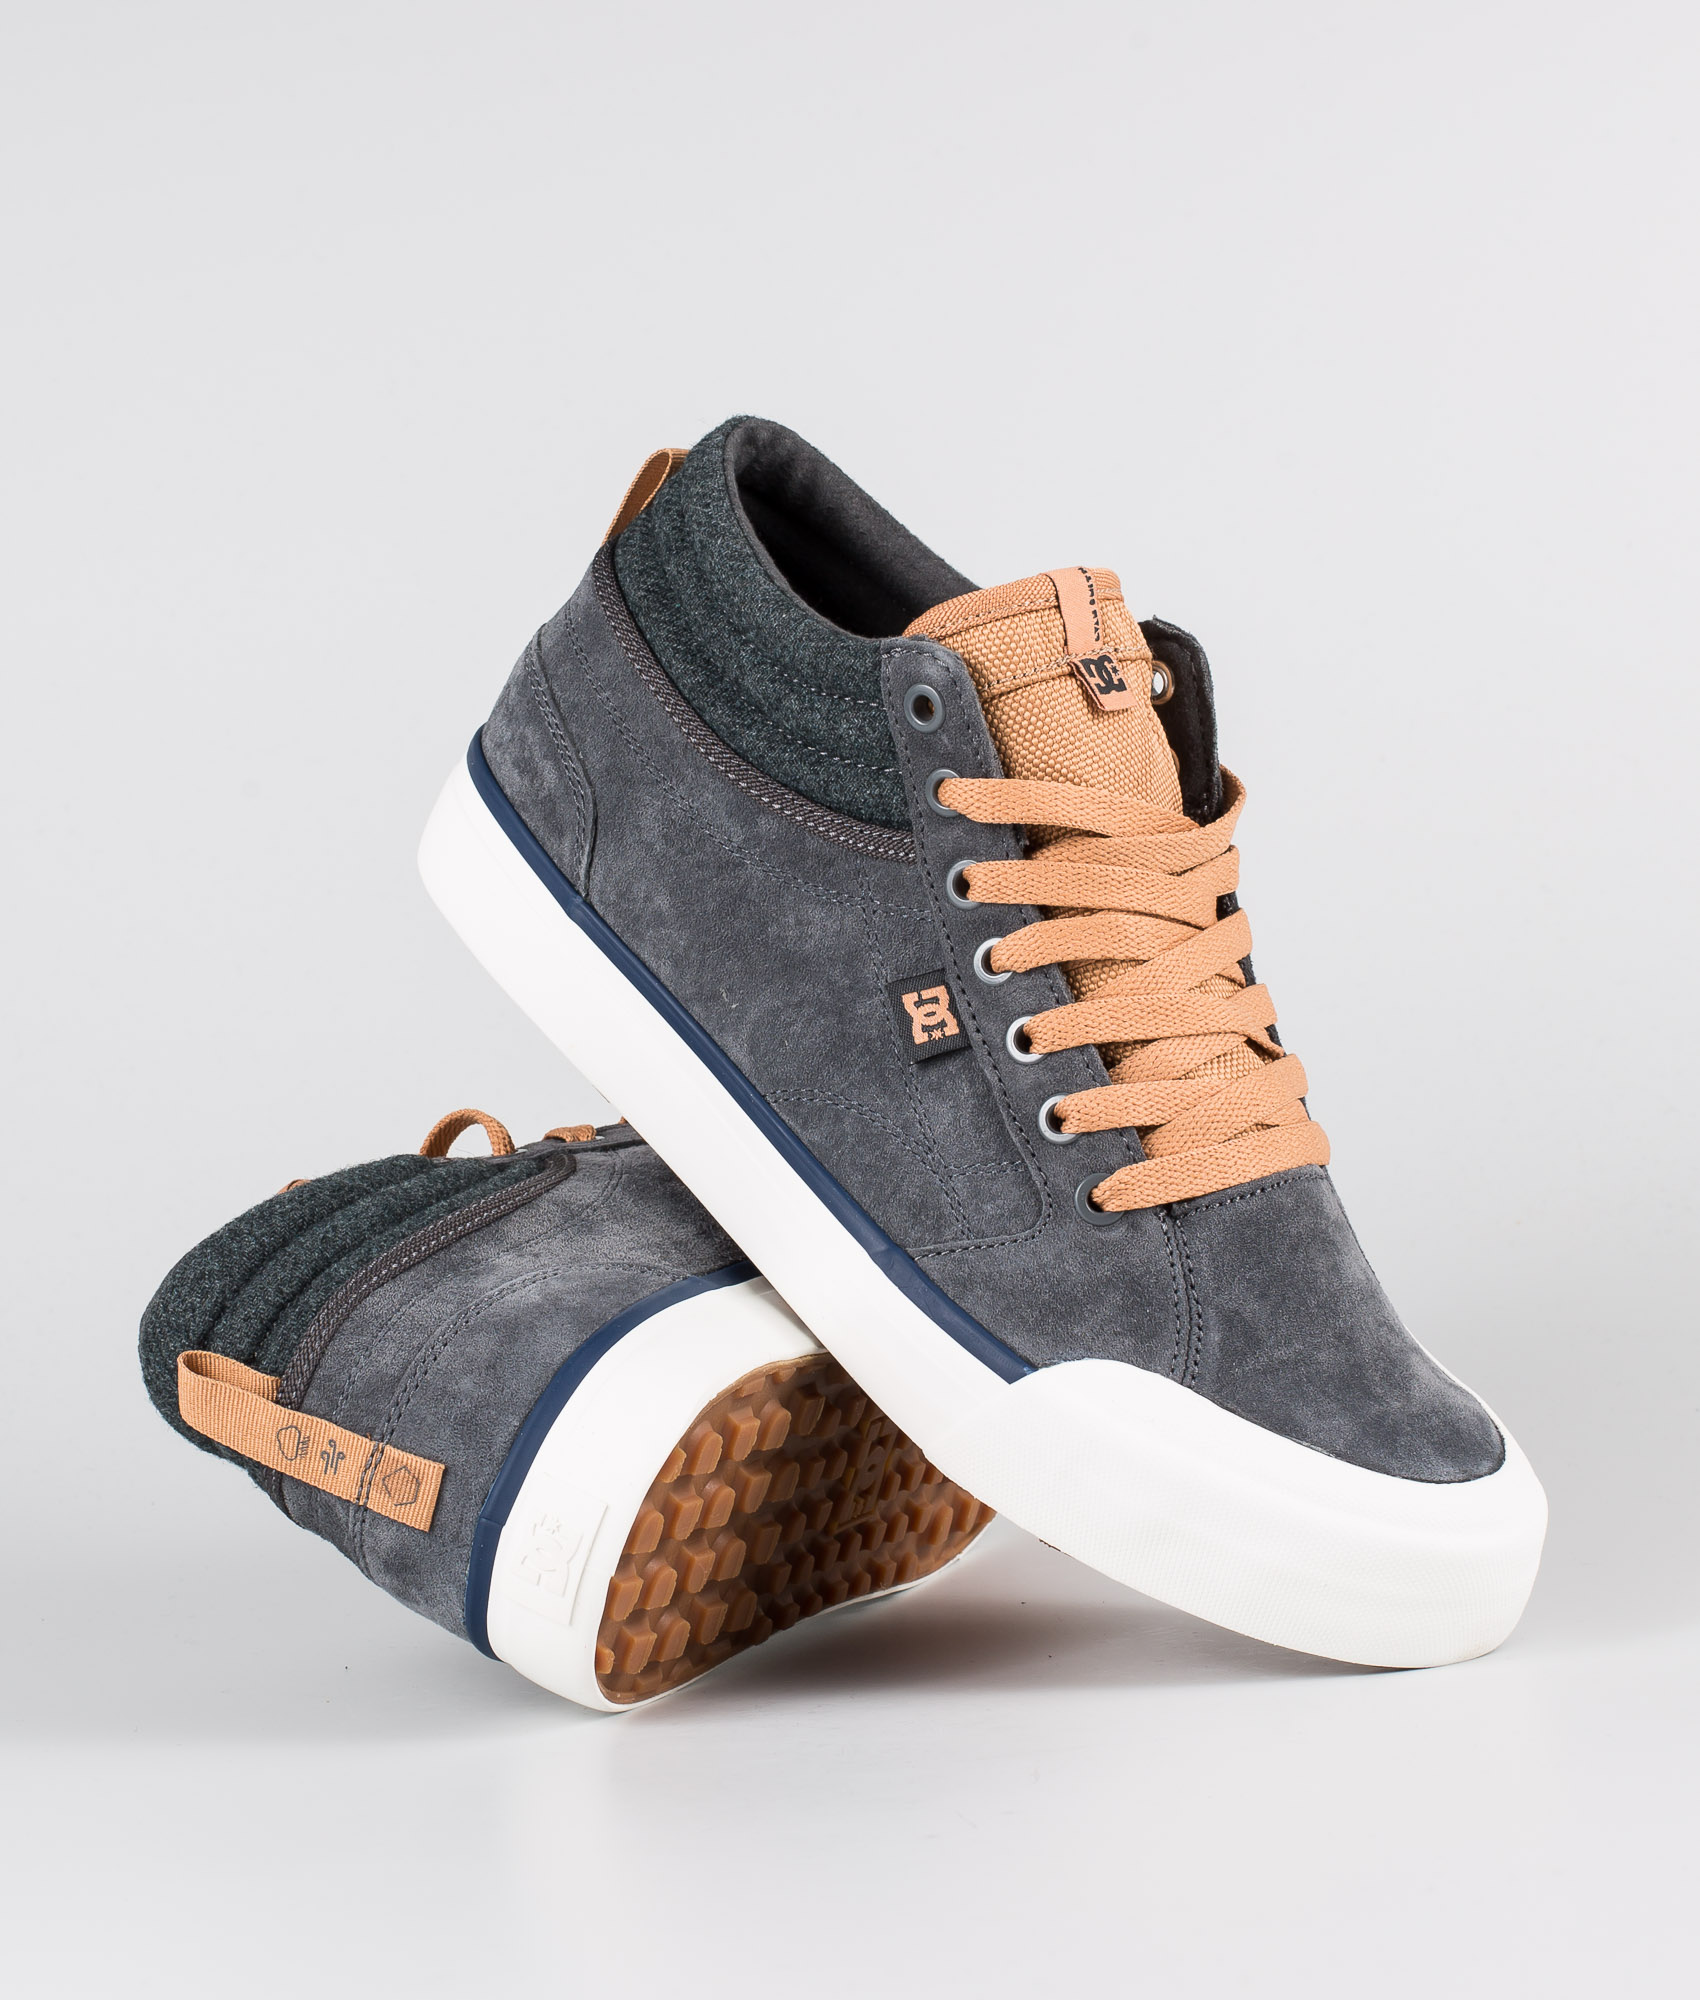 DC Evan Smith Hi Wnt Shoes Grey/Gum